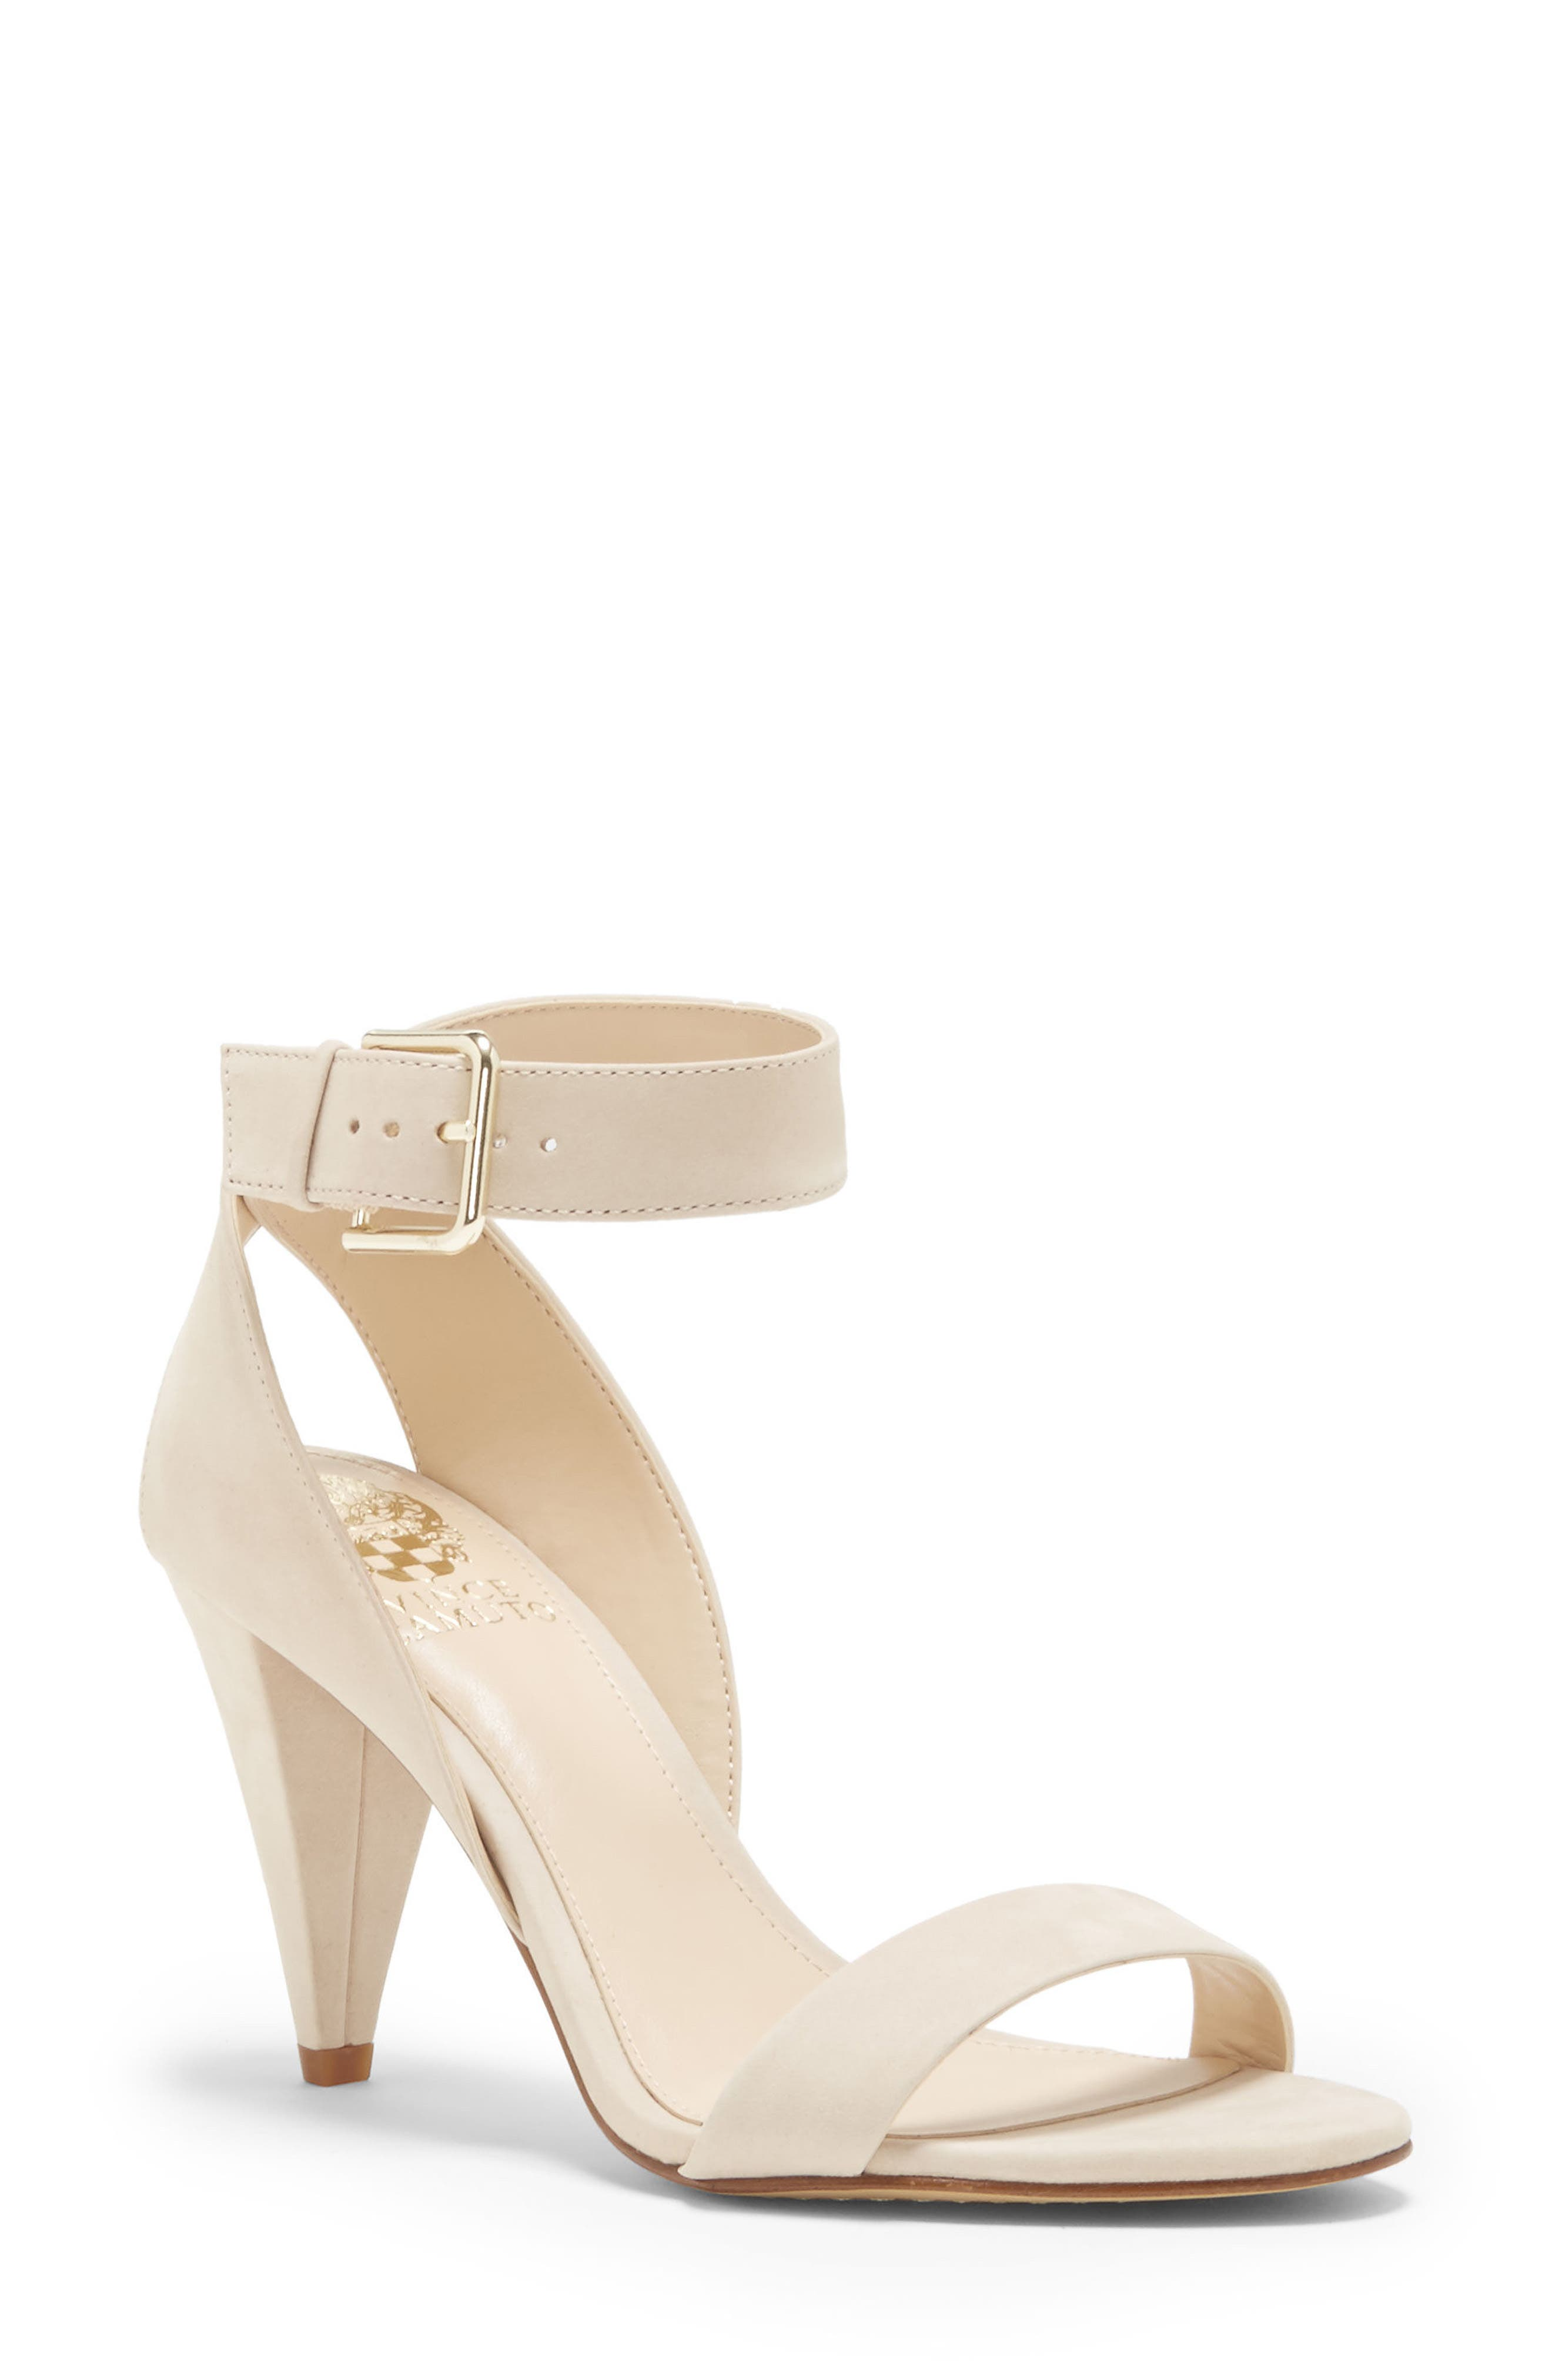 Caitriona Sandal,                         Main,                         color, Nude Leather